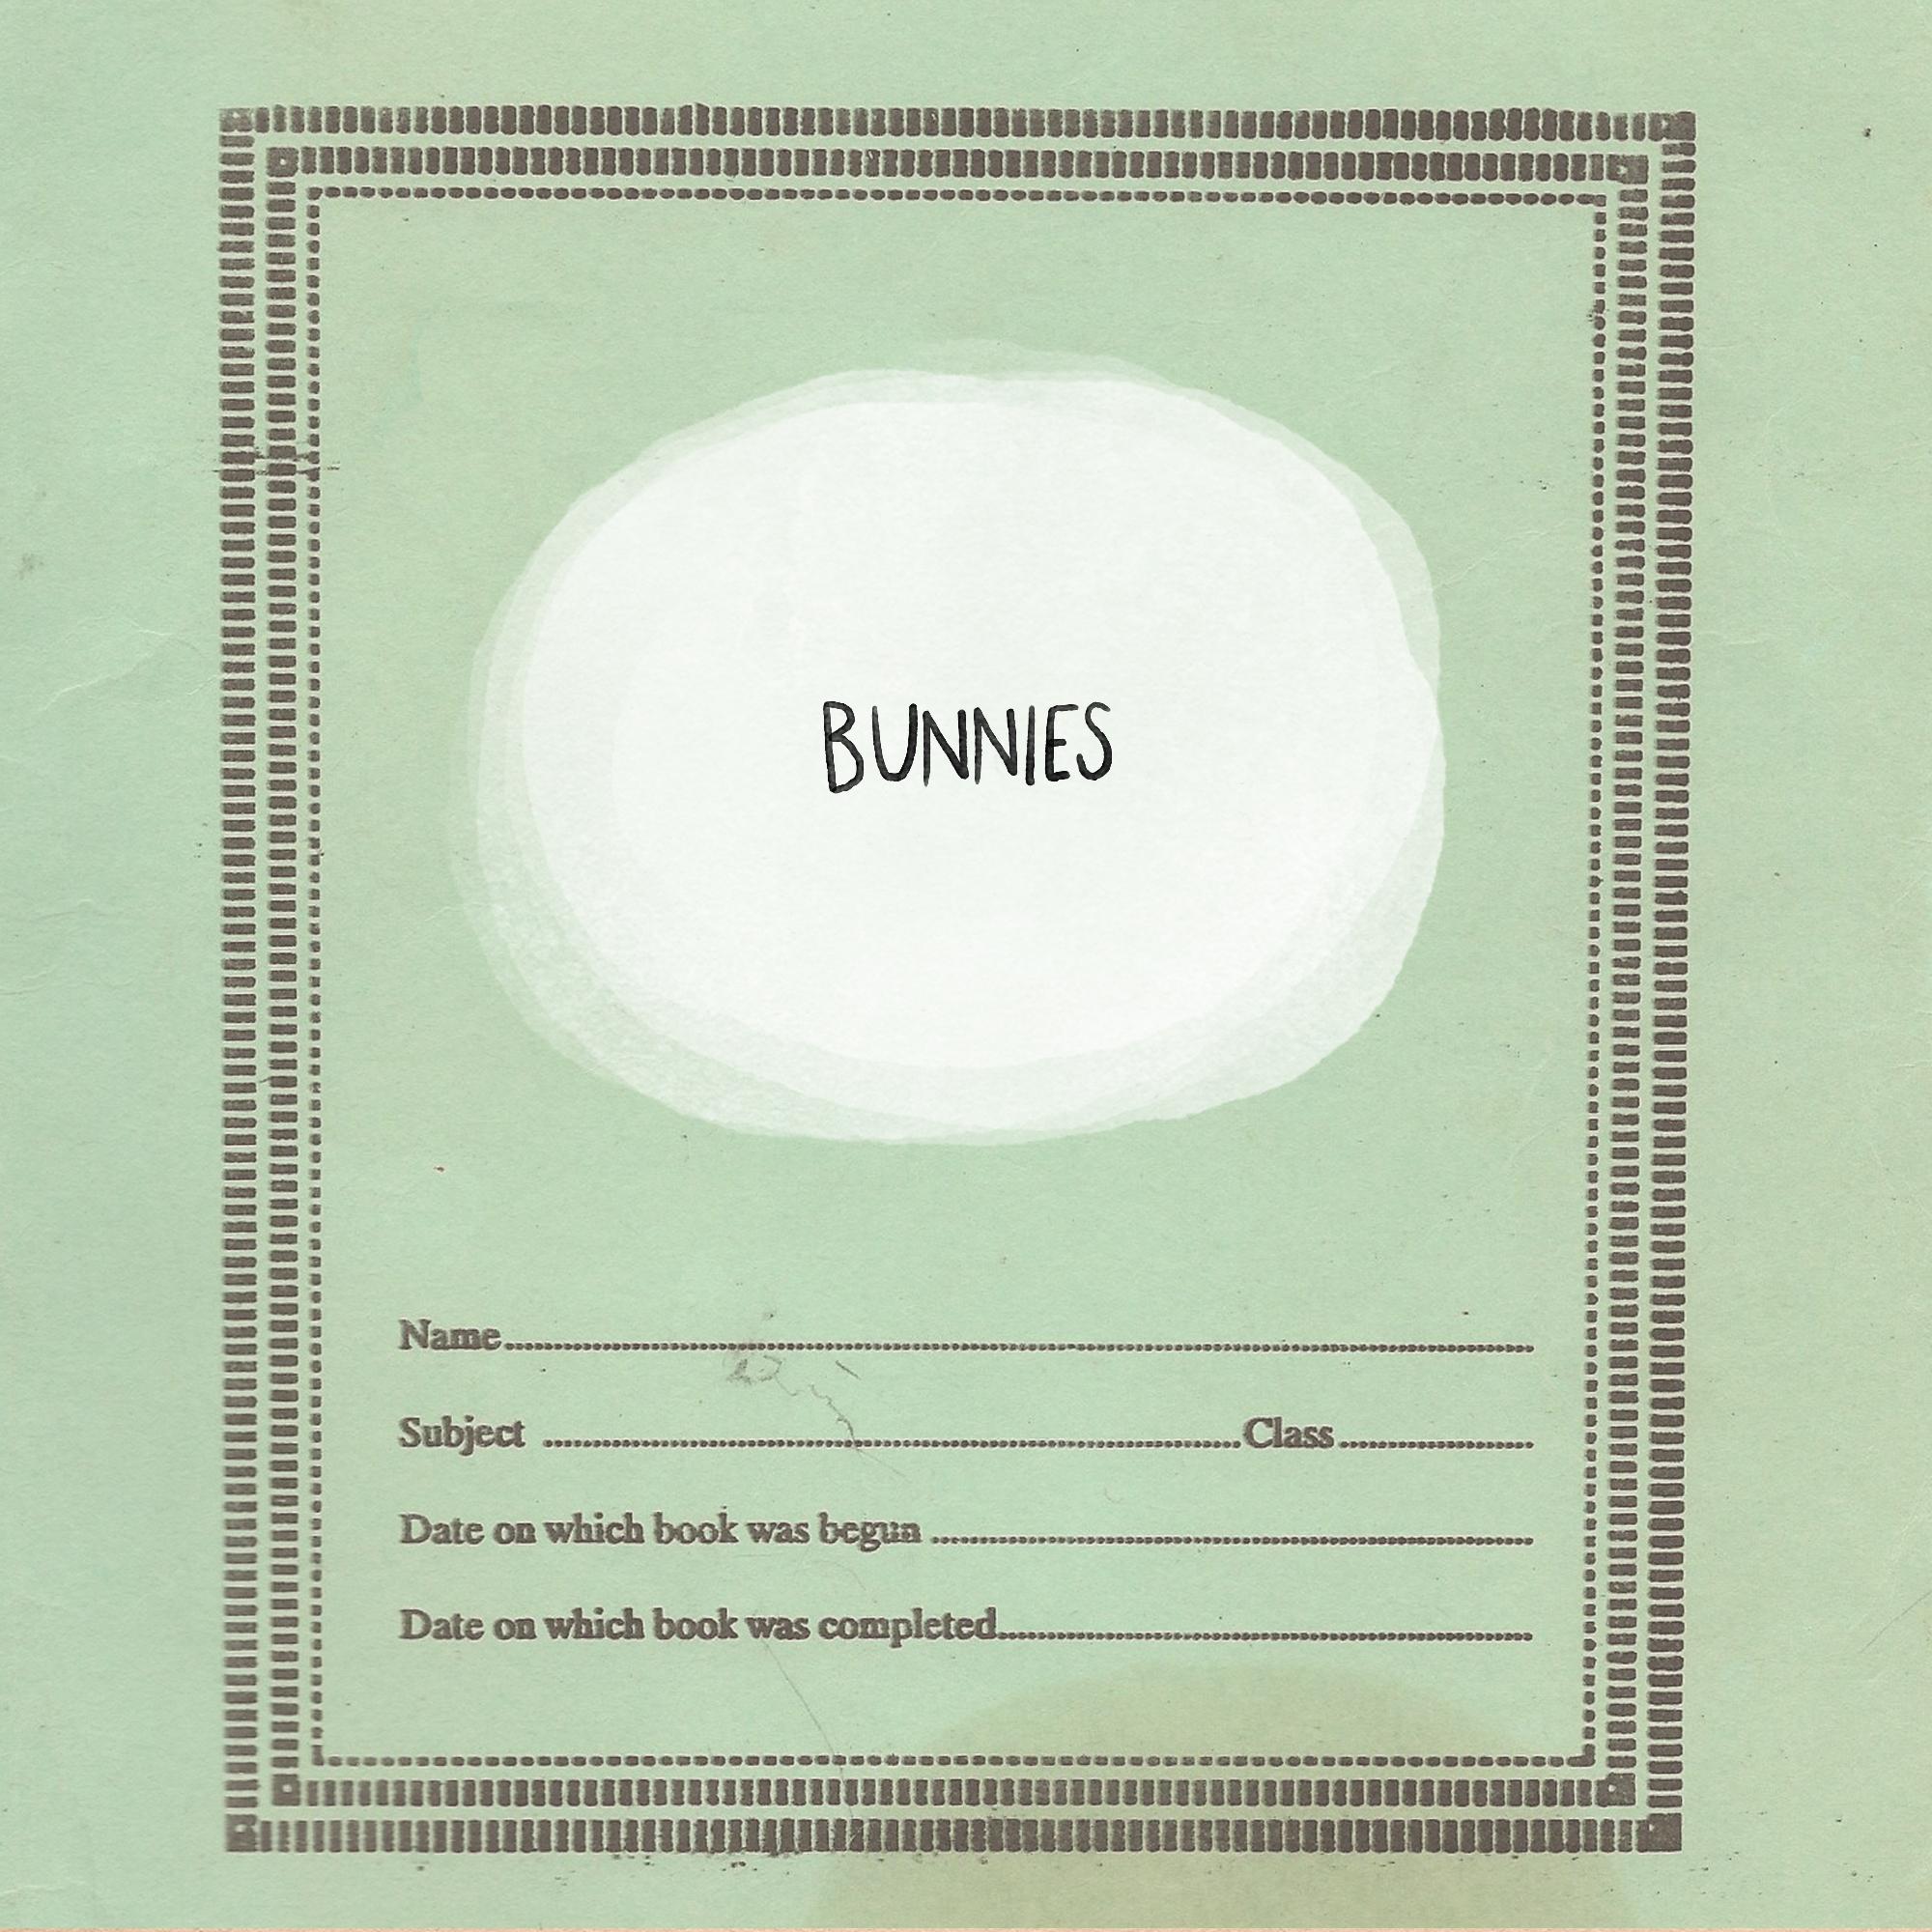 Bunnies_title